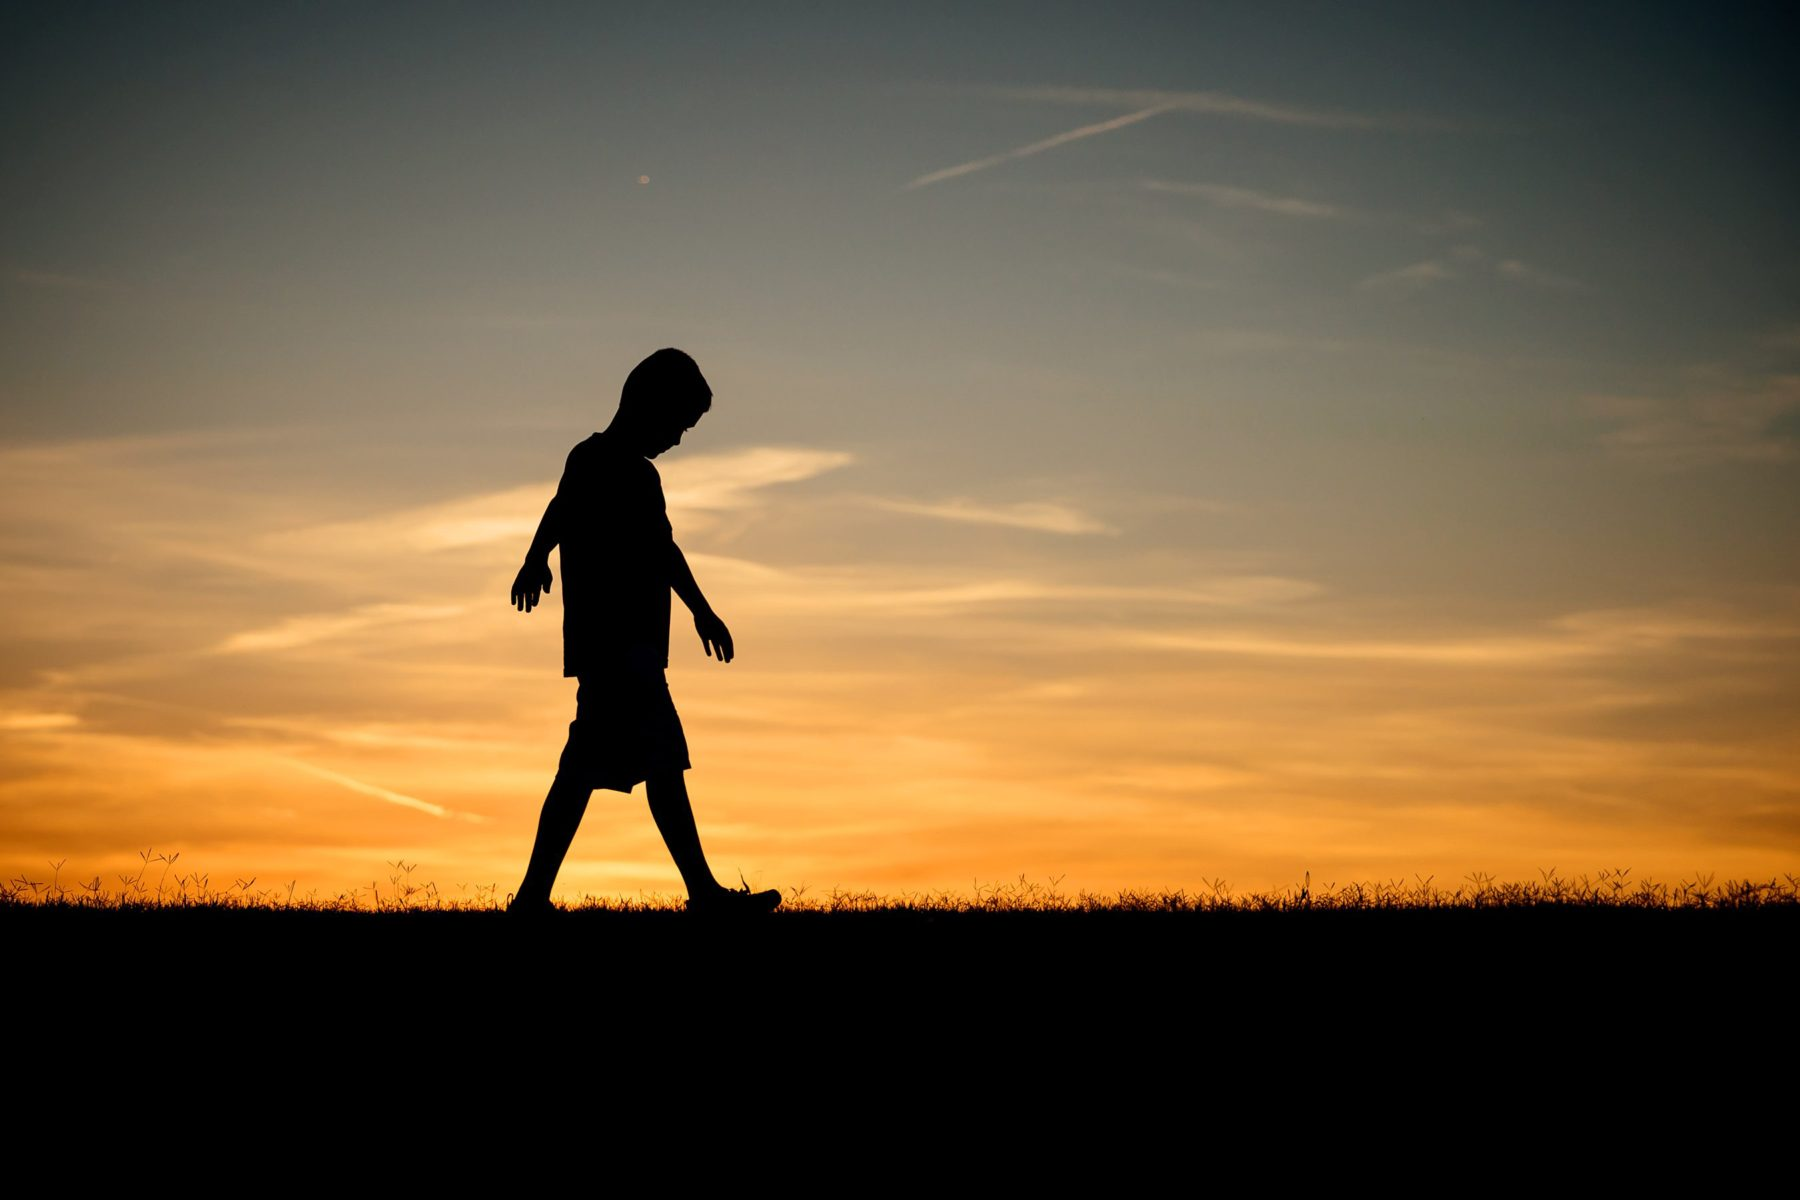 nine year old boy silhouette